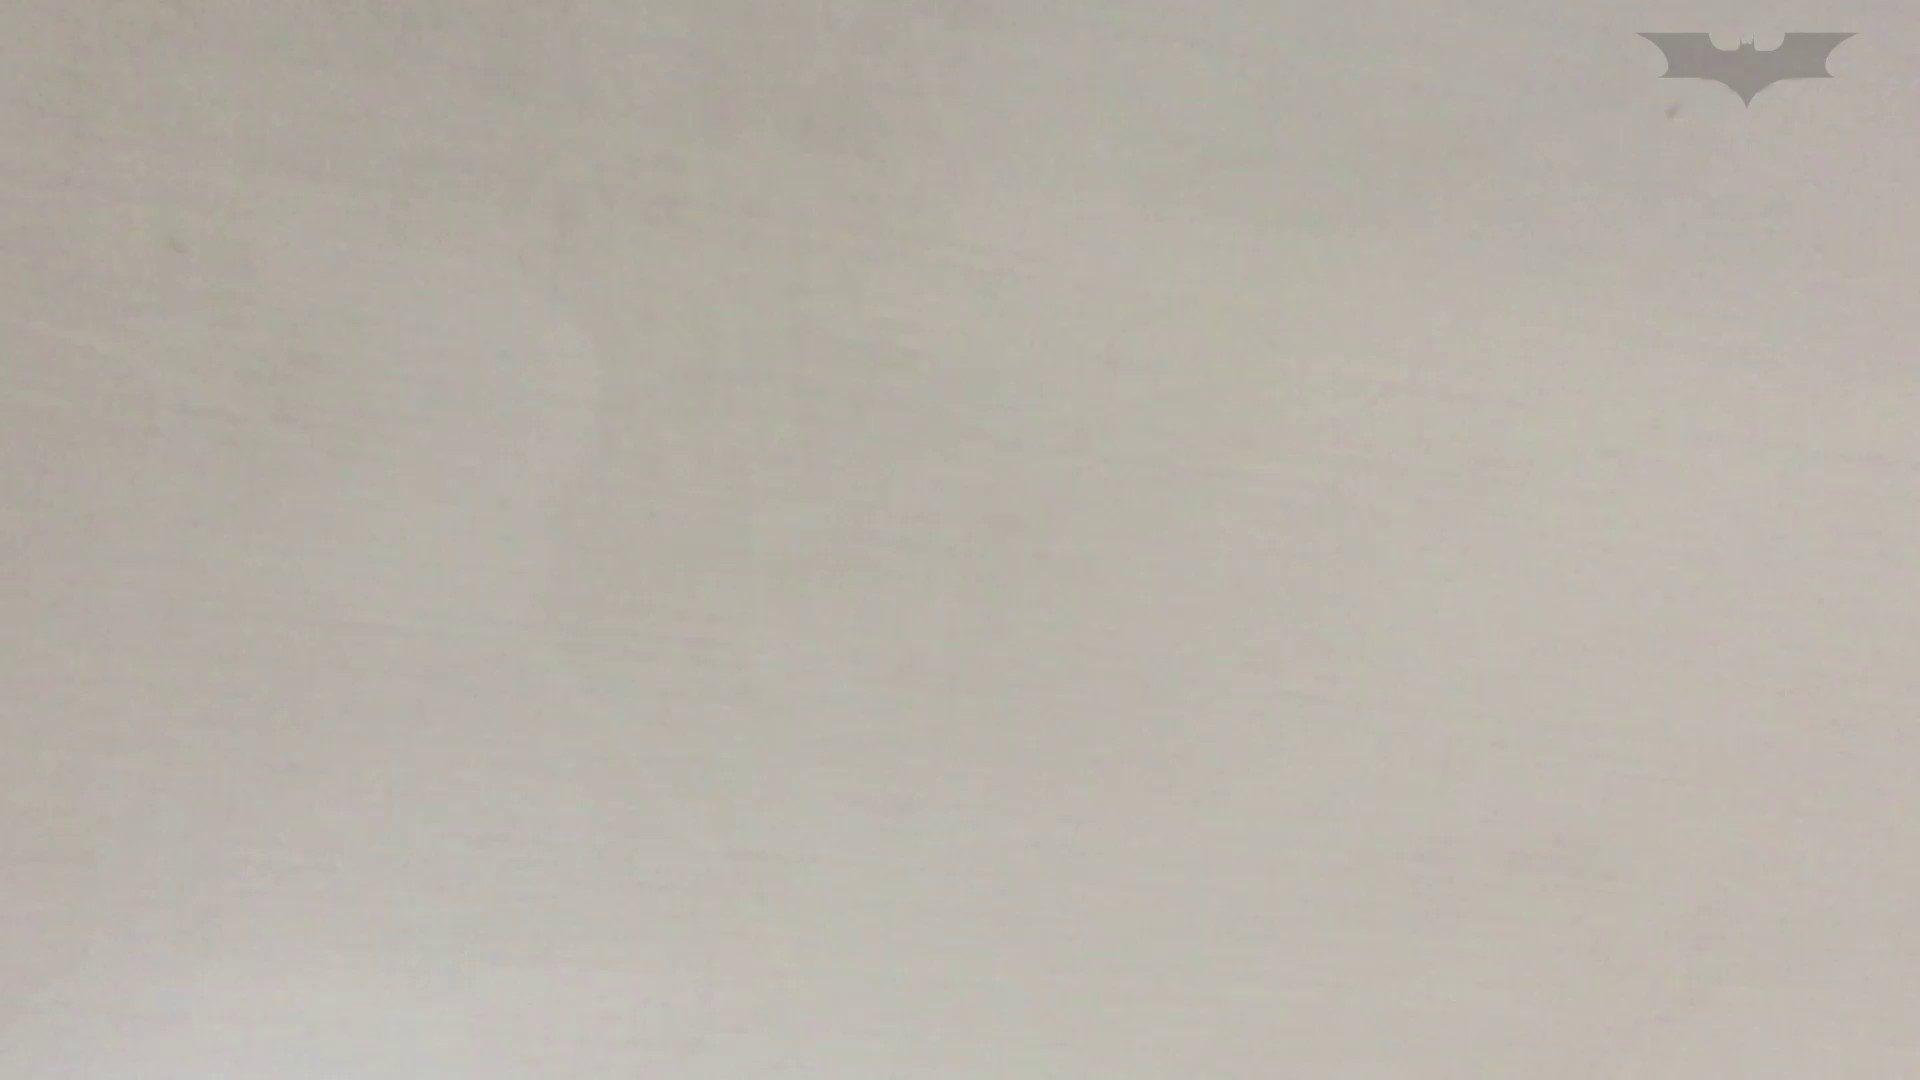 JD盗撮 美女の洗面所の秘密 Vol.74 美肌 オマンコ動画キャプチャ 109画像 25